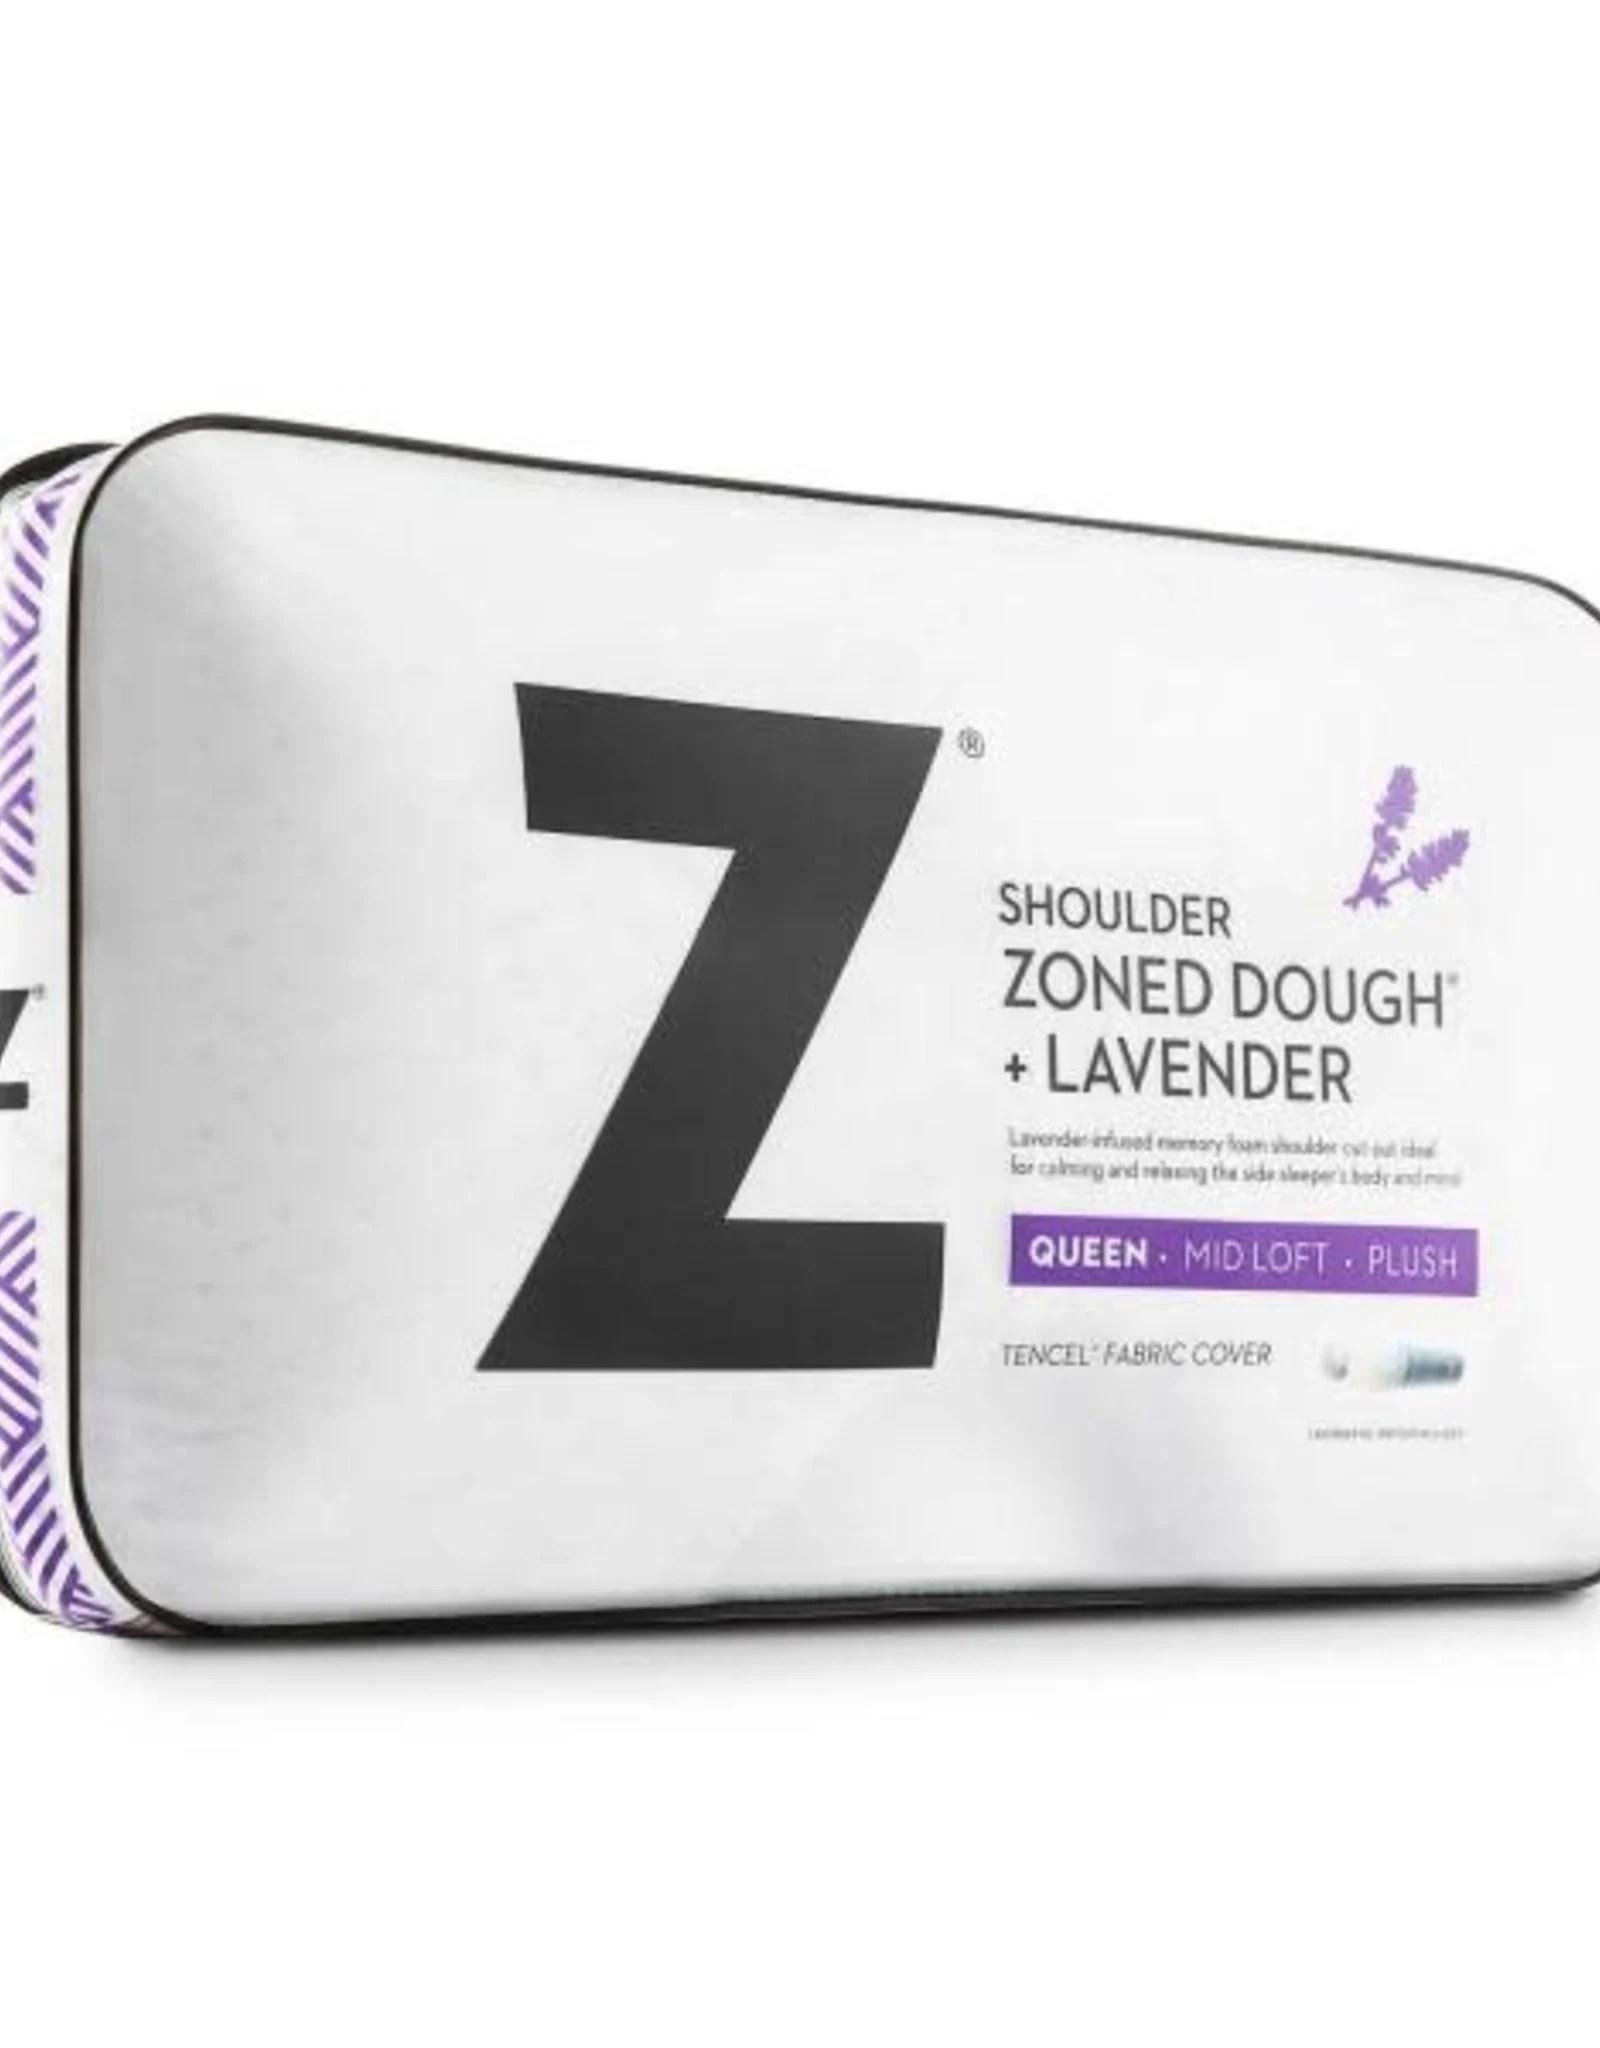 malouf z shoulder cutout zoned dough pillow lavender